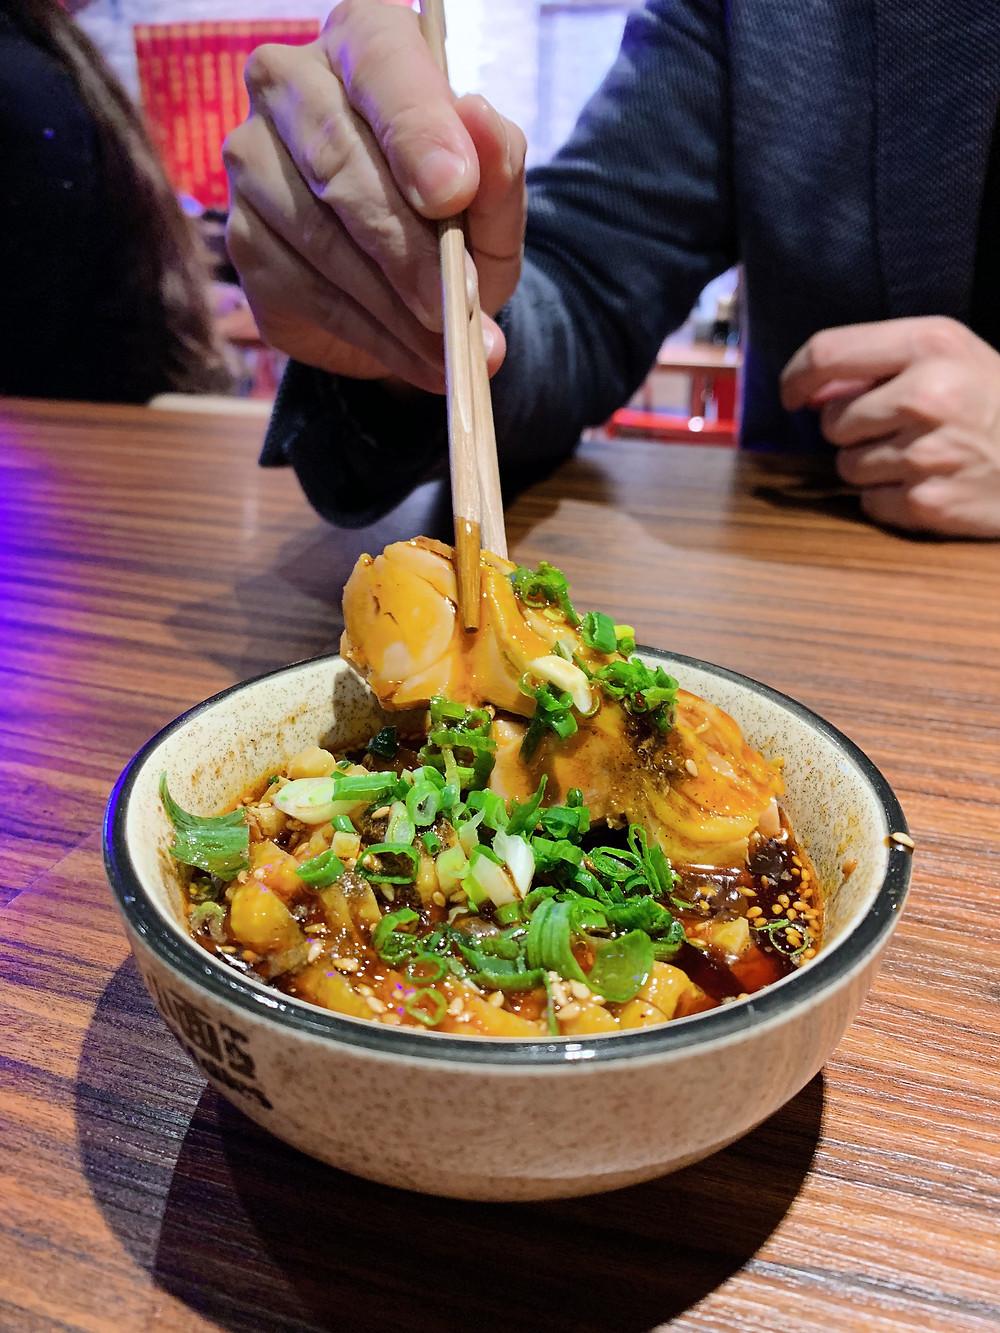 Food at Crazy Noodles restaurant in Hong Kong